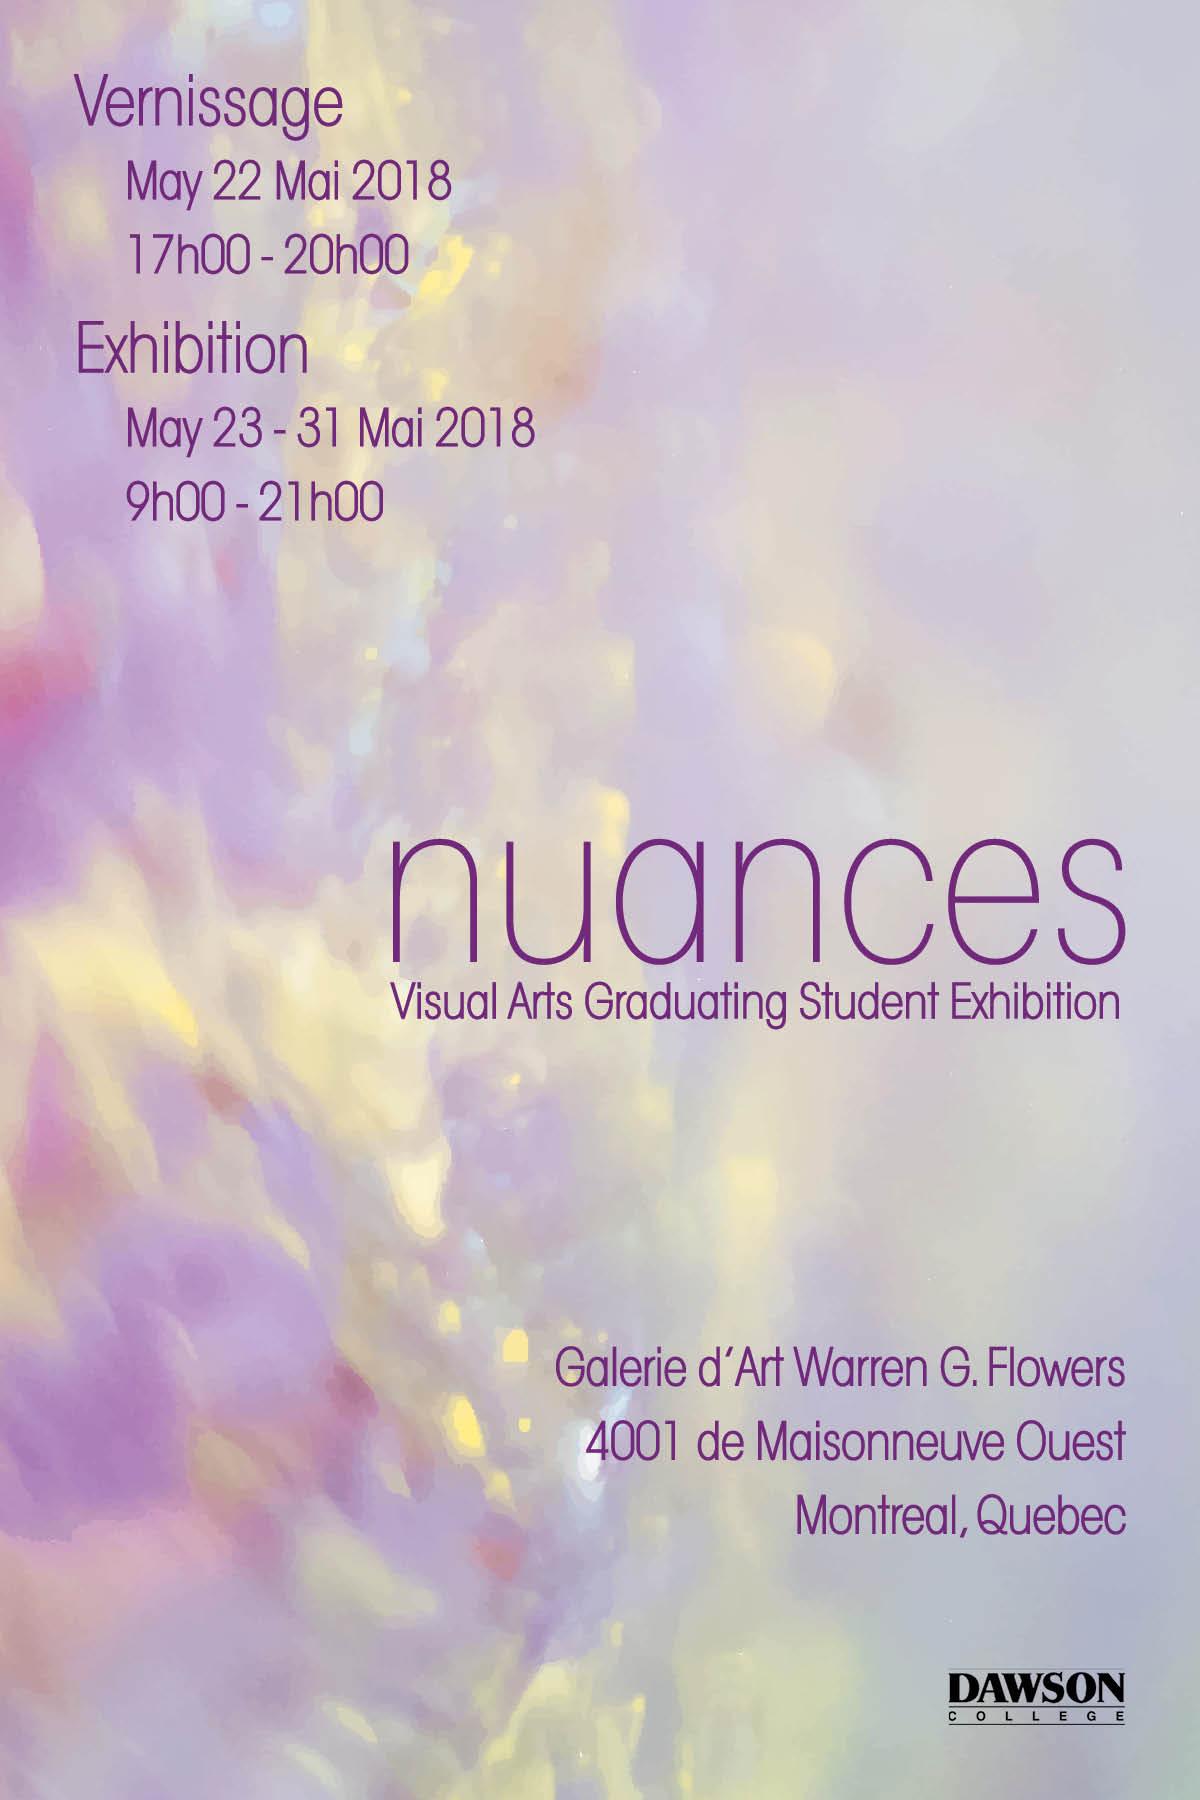 nuances_invitation